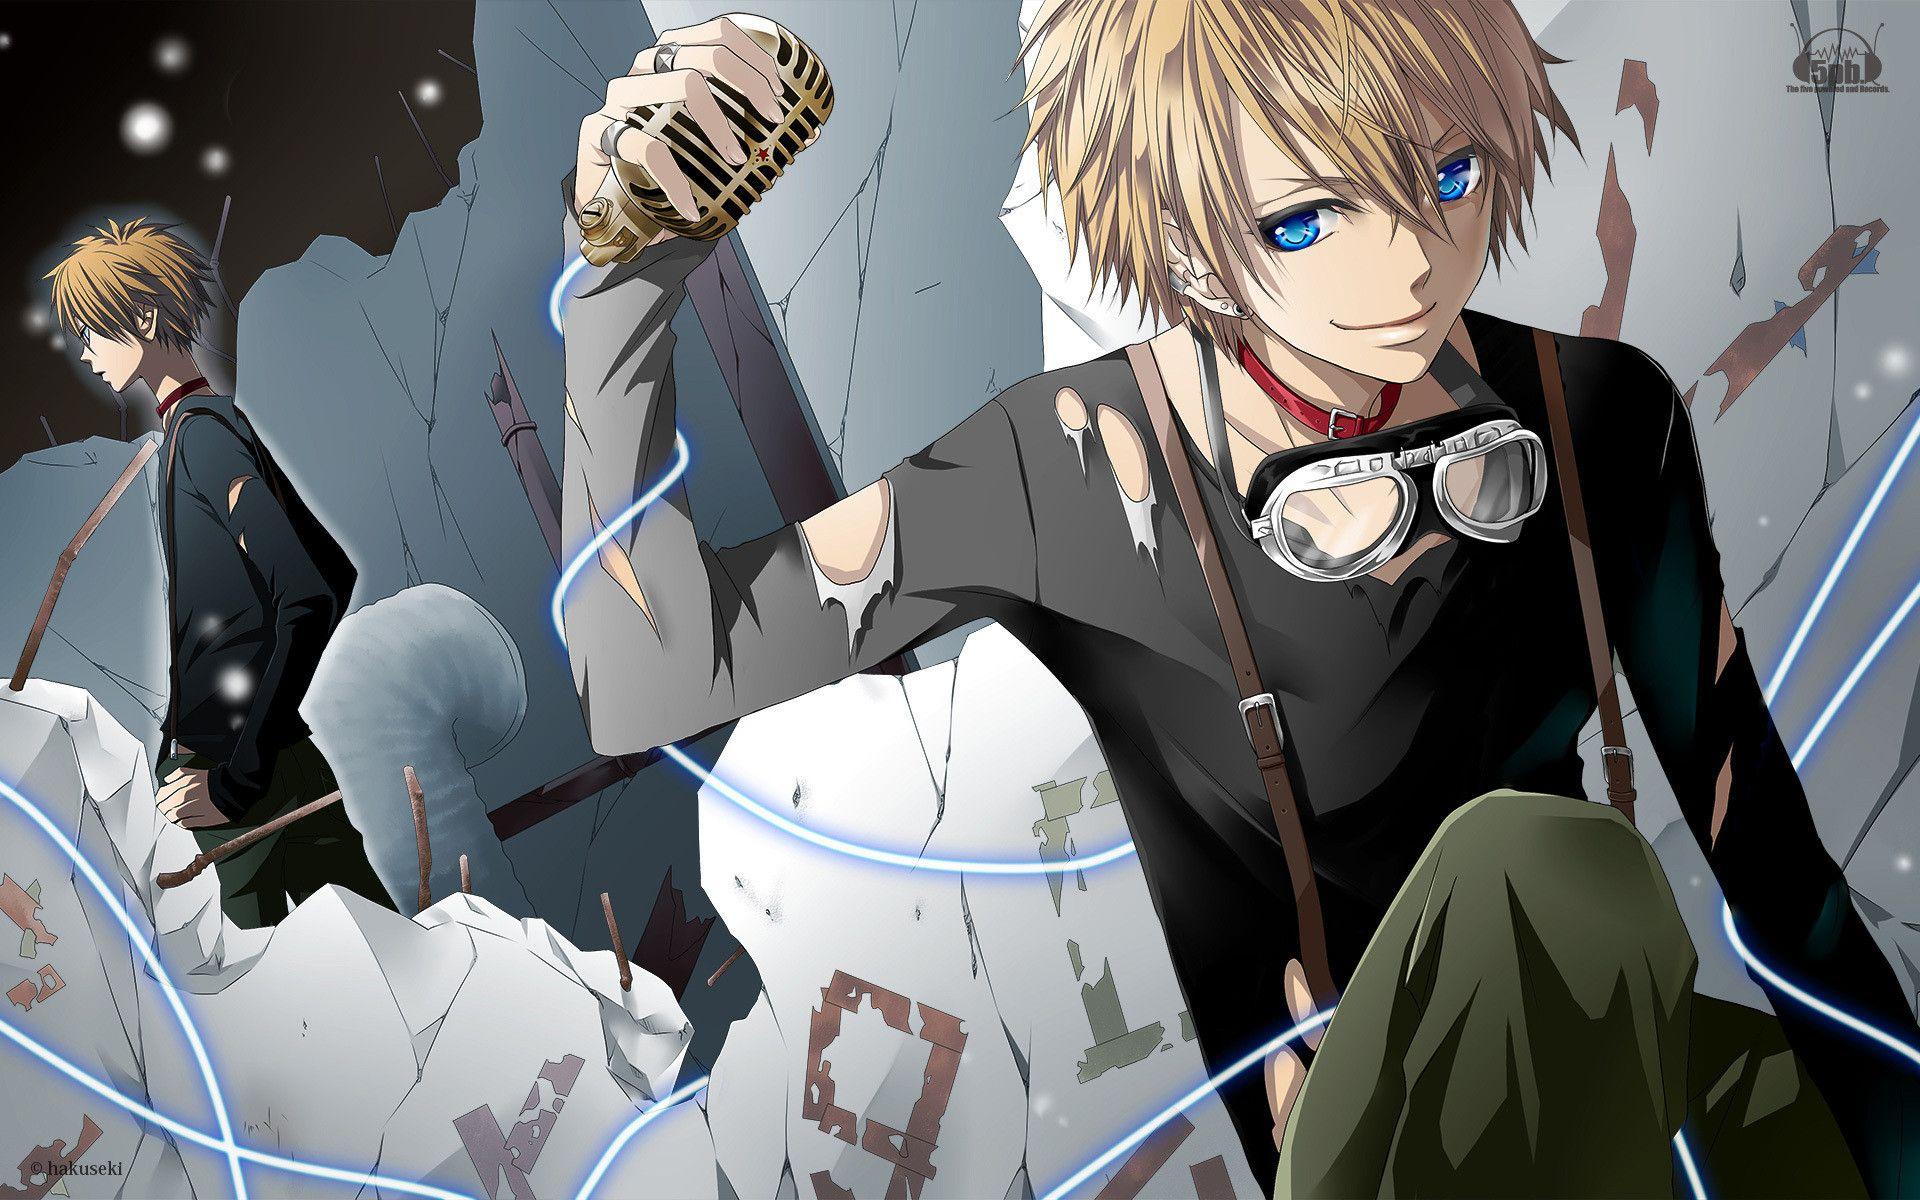 Anime Boys Wallpapers Anime Android Wallpaper Anime Hd Anime Wallpapers